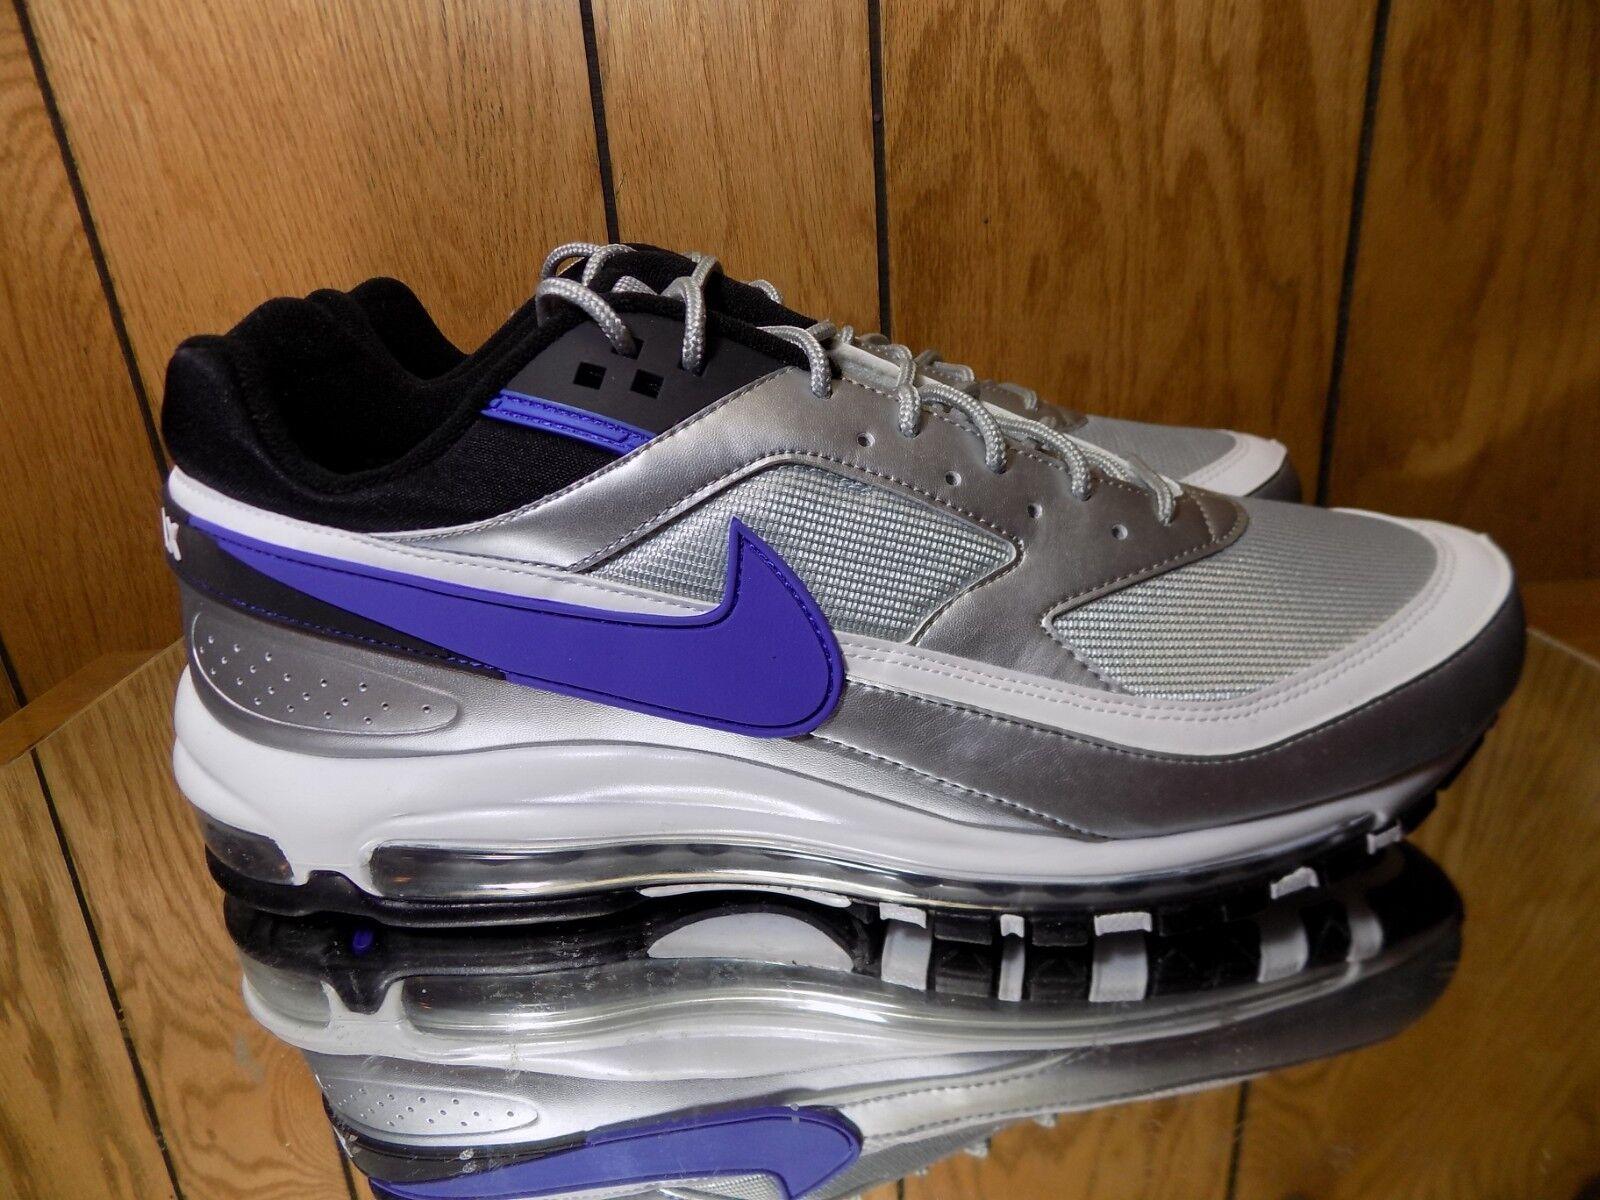 AO2406-002) Nike AIR Max 97 BW- Persian purple- NEW s 14